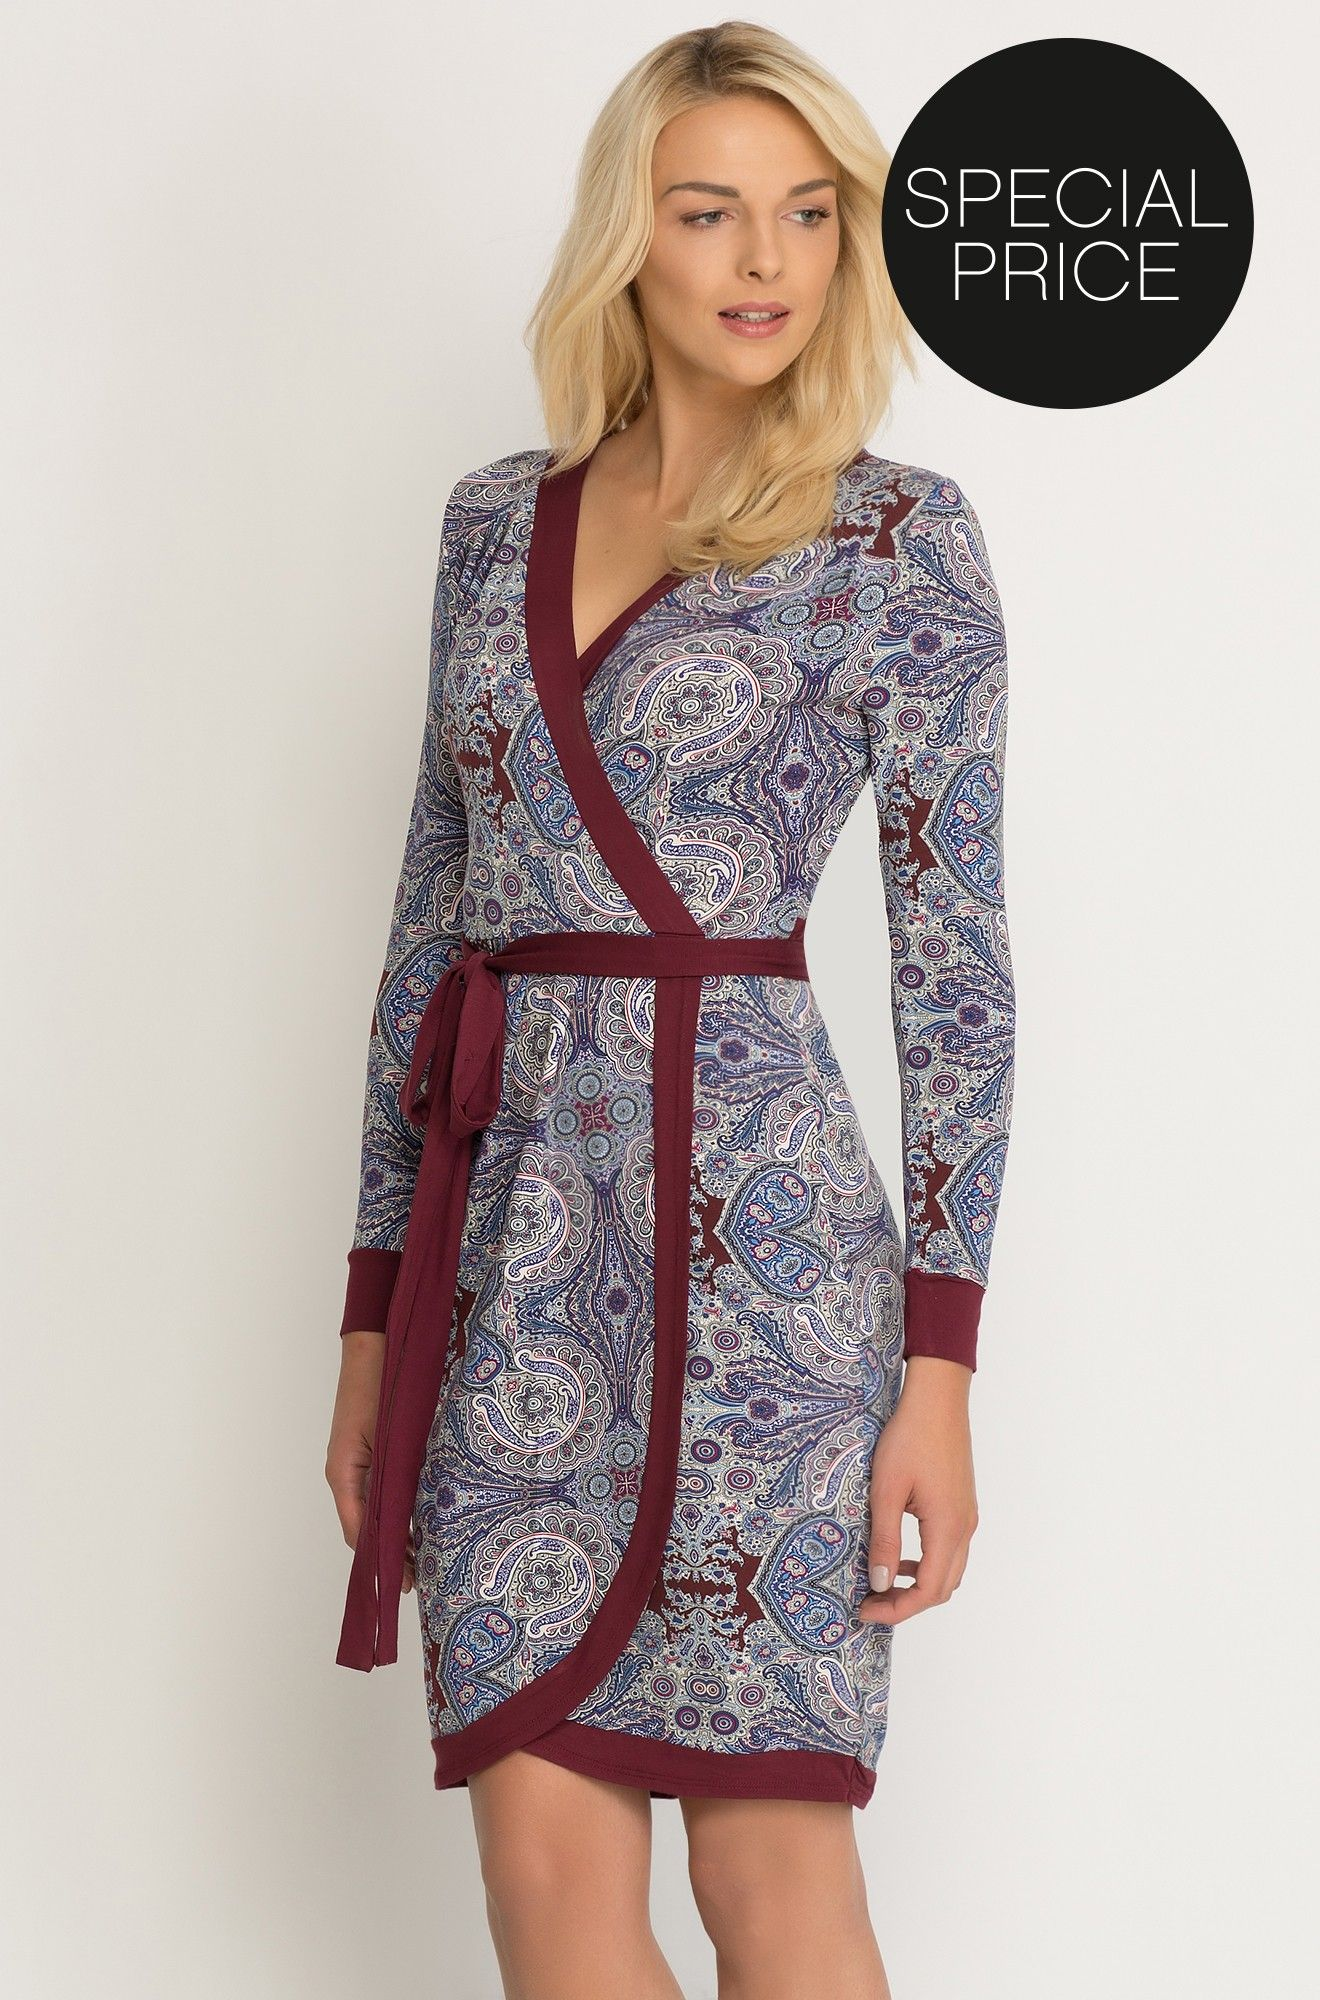 kopertowa sukienka ze wzorem paisley   schöne kleider